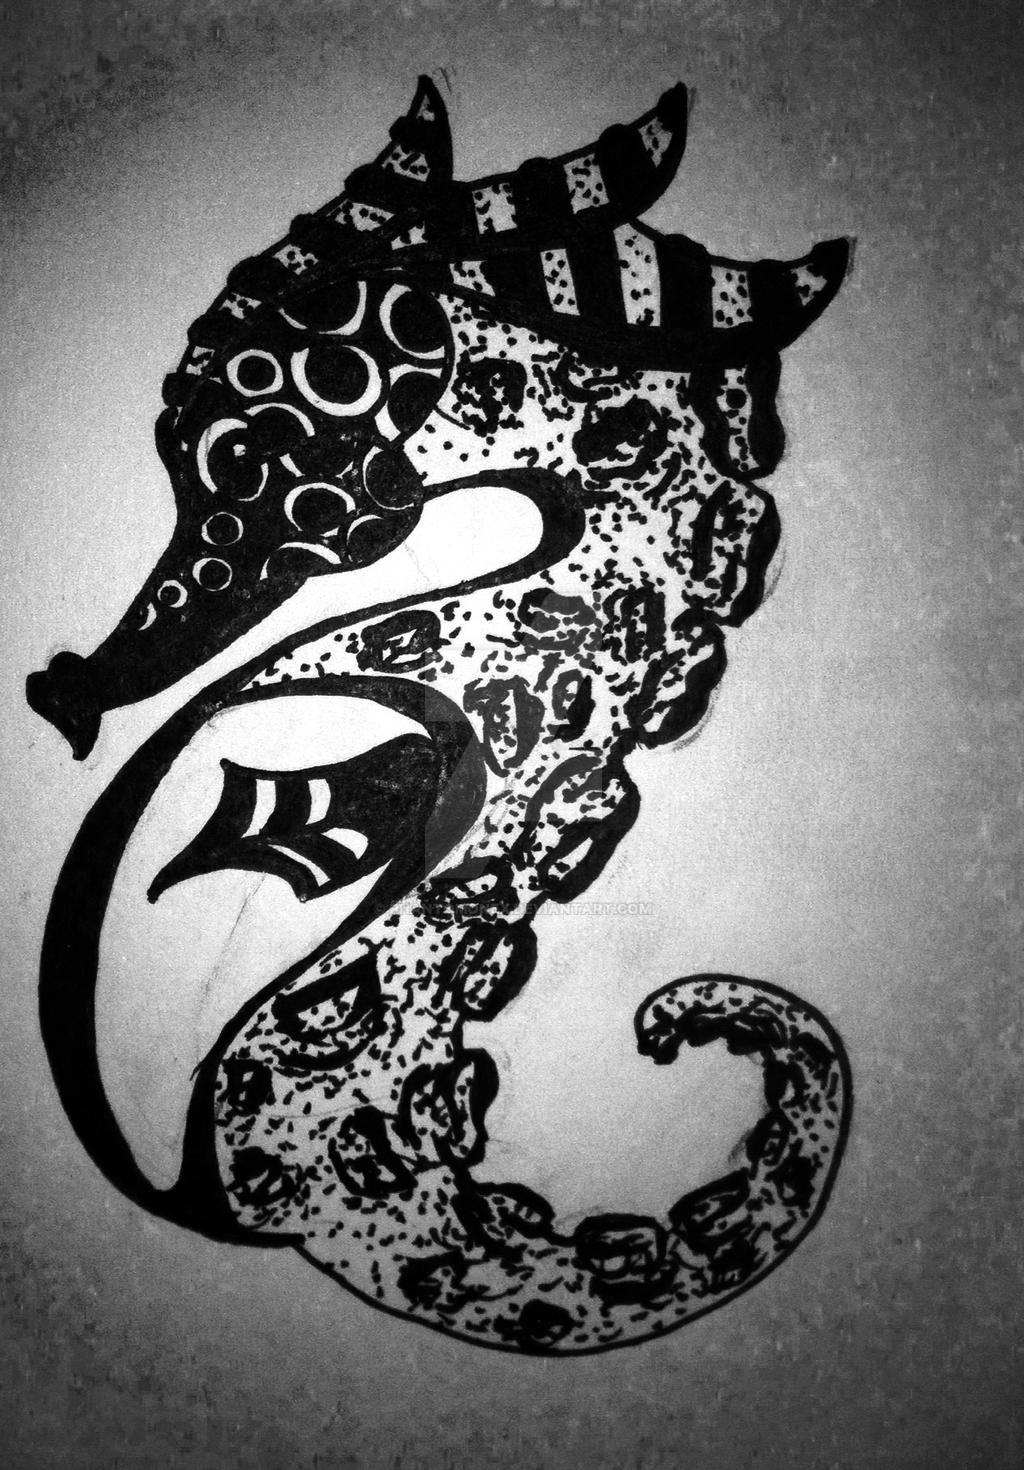 Seahorse by phantomonex